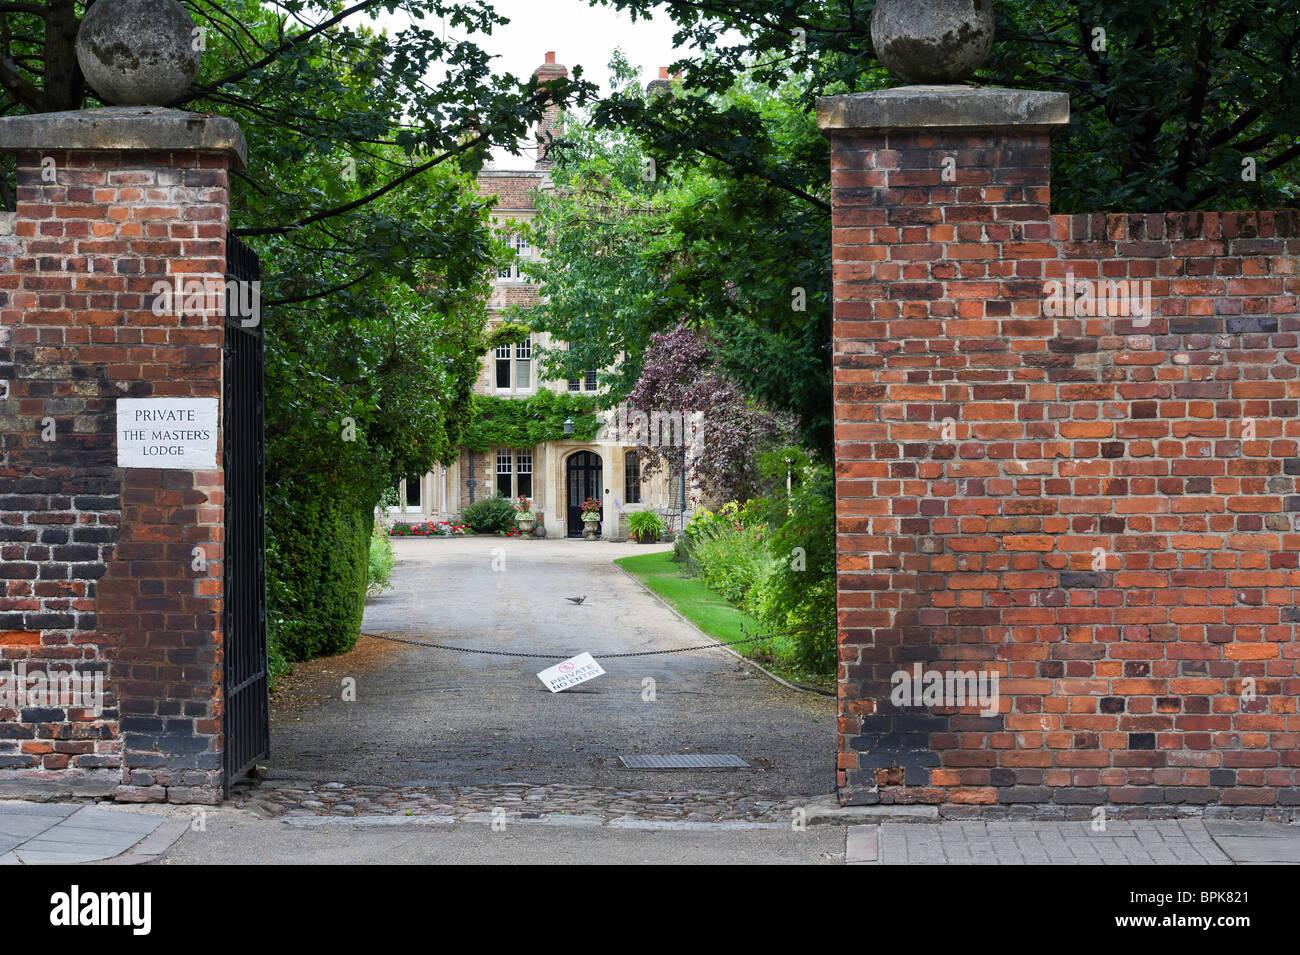 Master's lodge, Jesus college, Cambridge university. - Stock Image